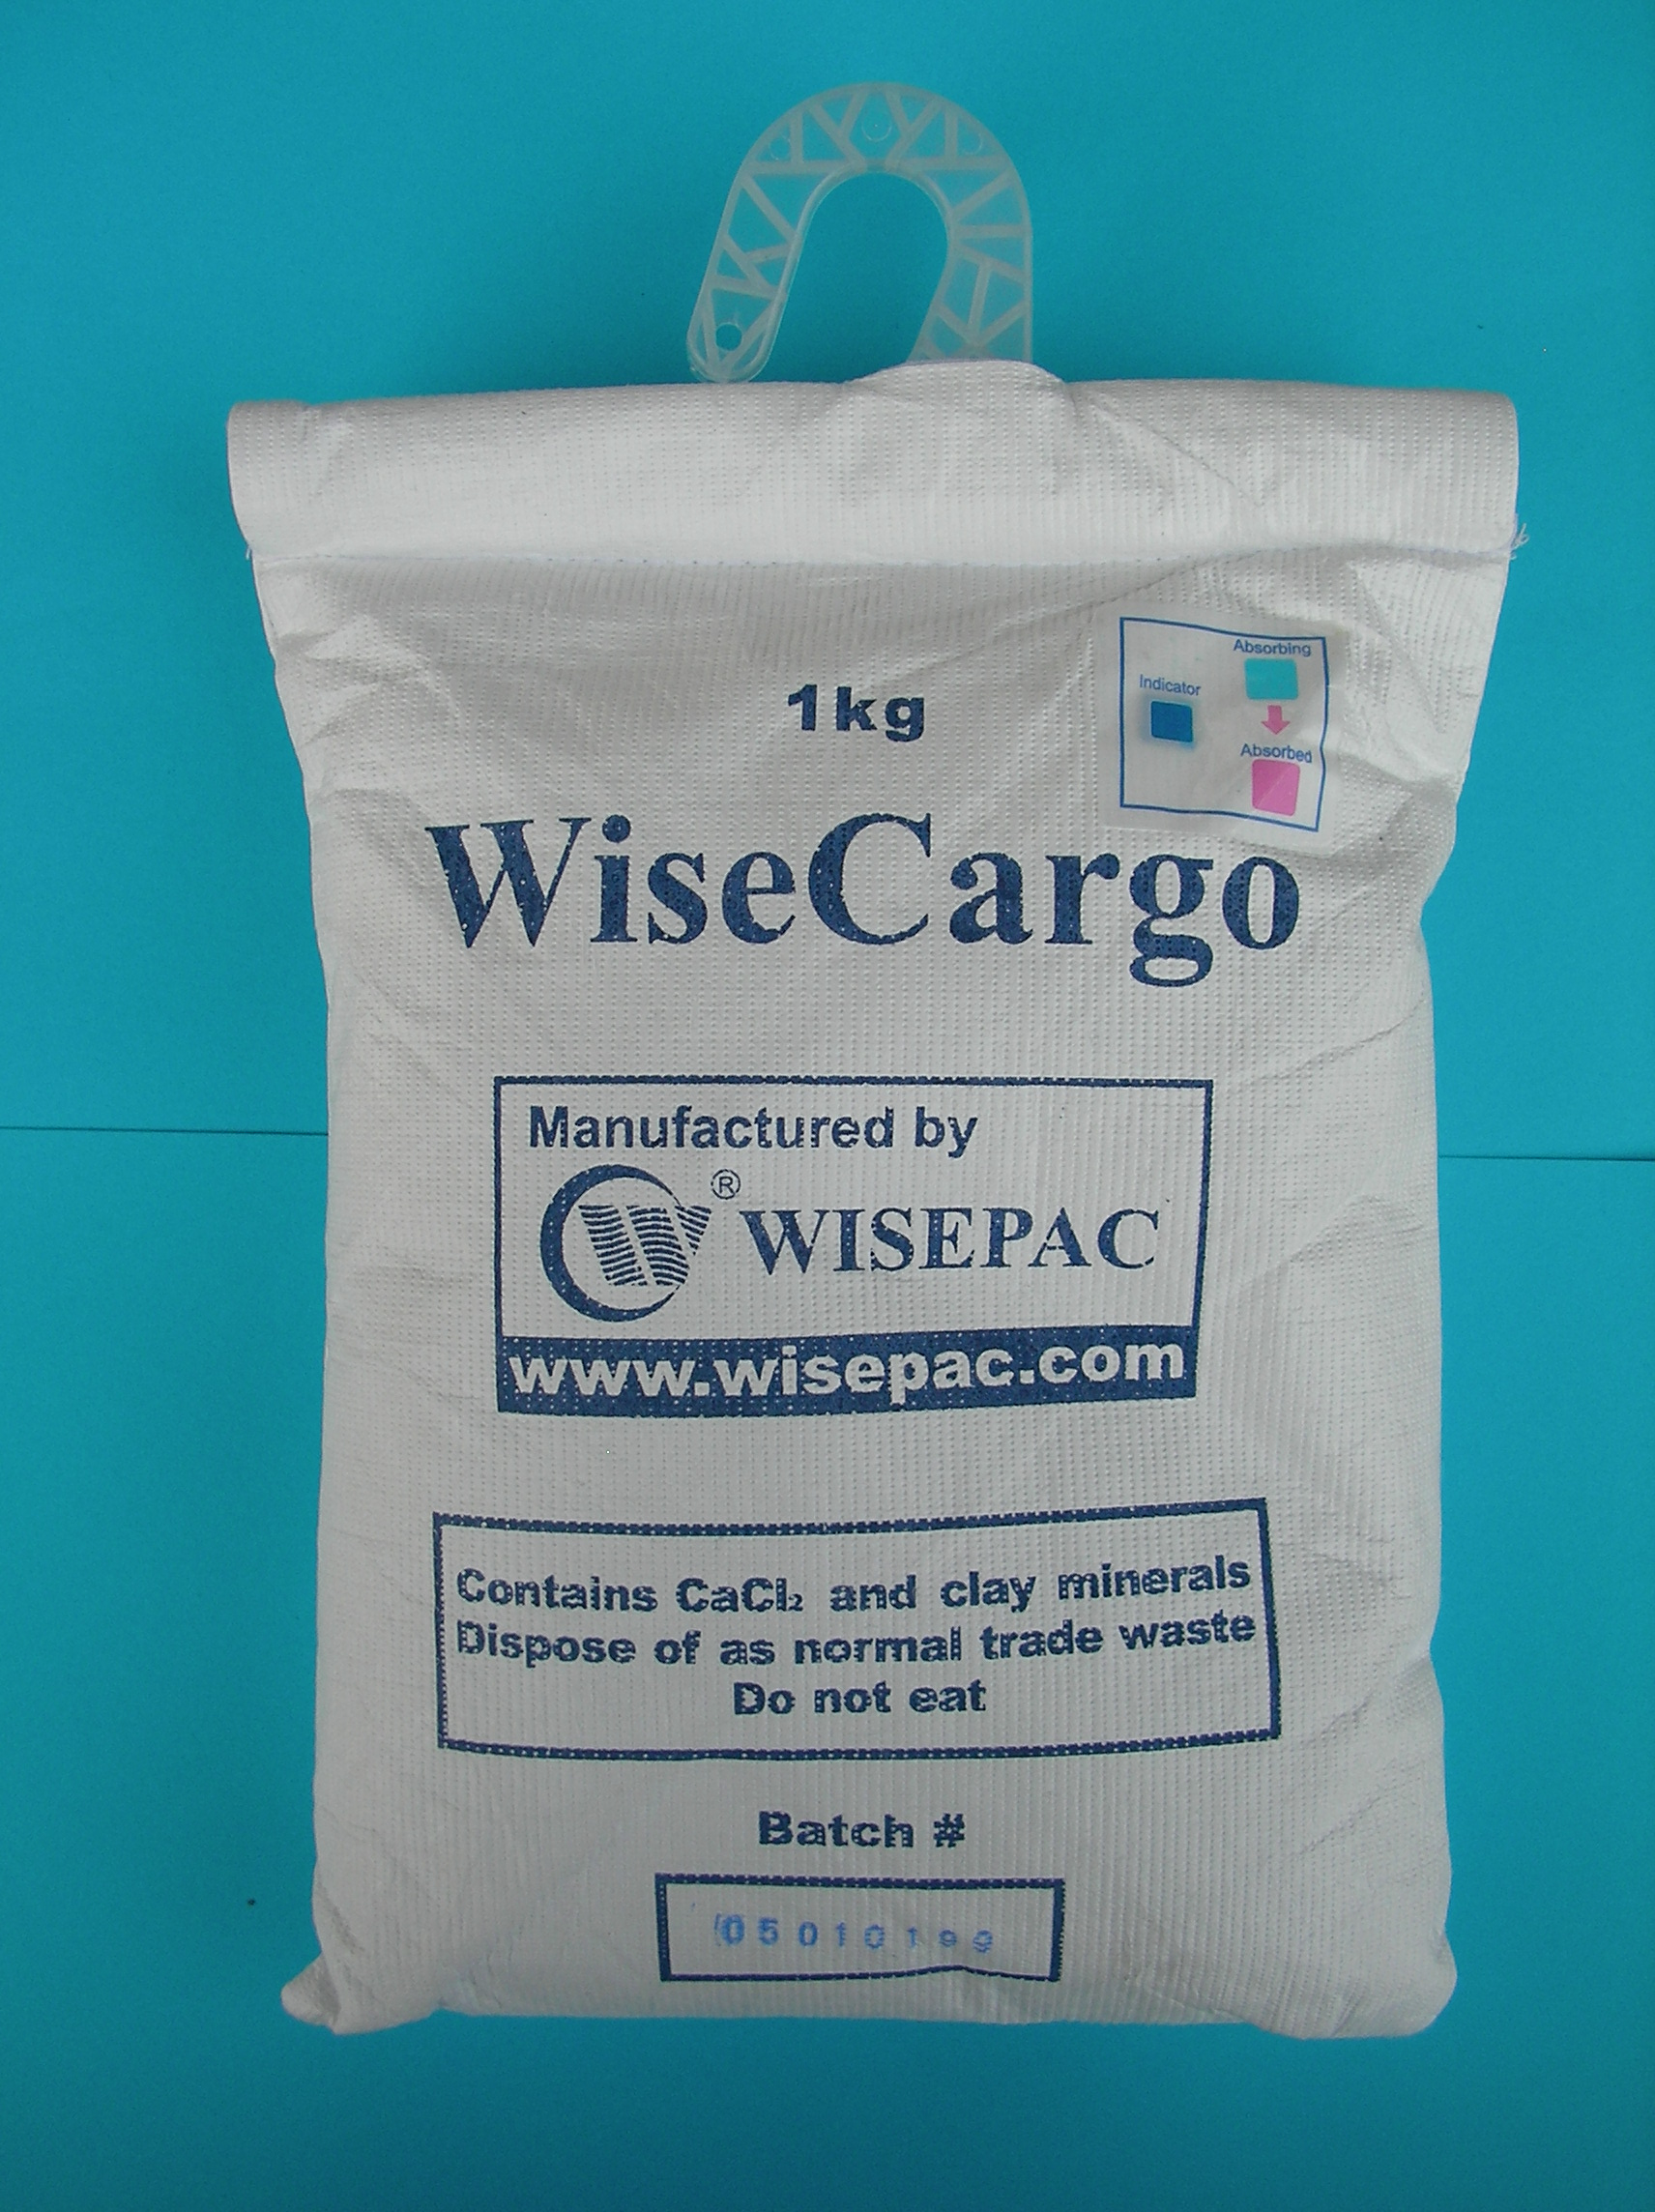 Wisecargo Container 1kg